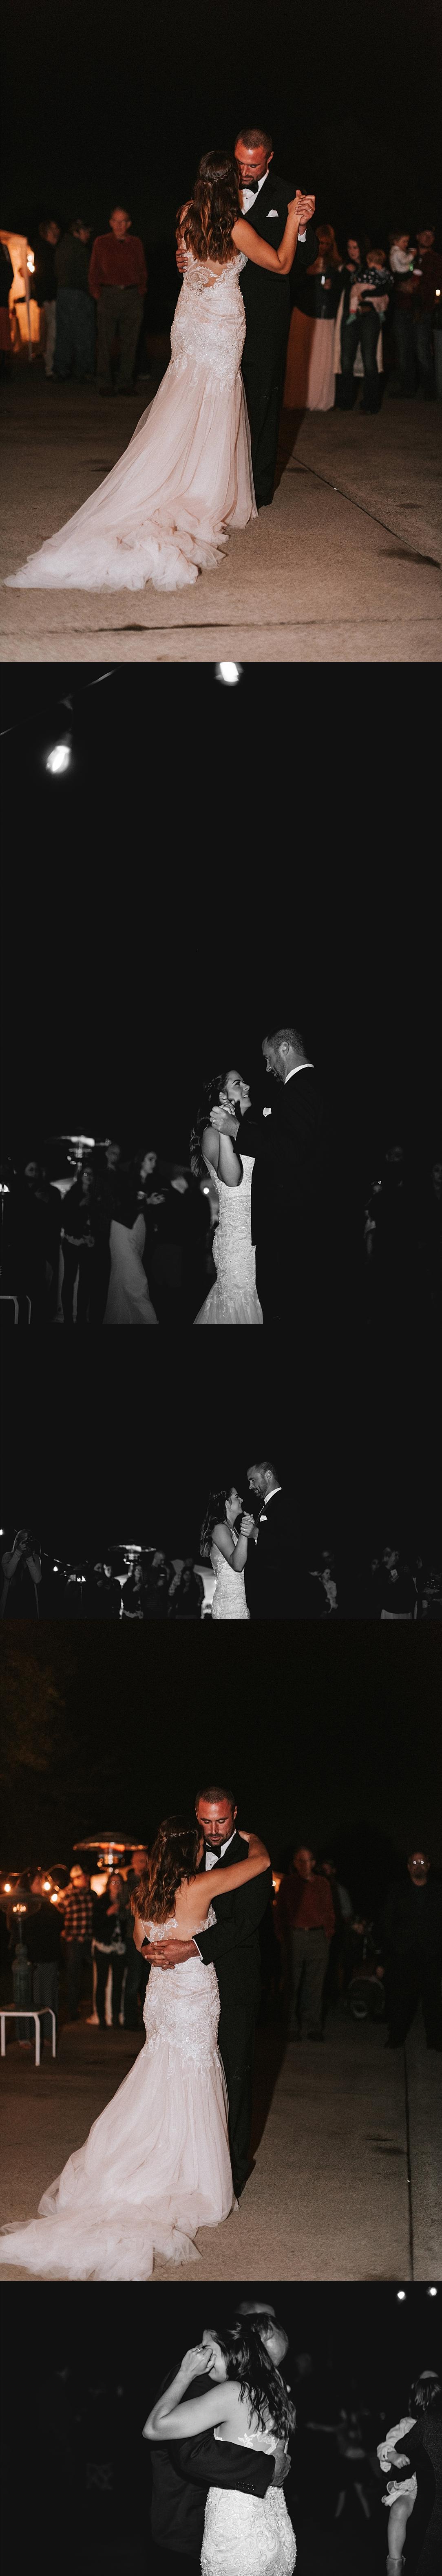 romantic backyard wedding_0052.jpg